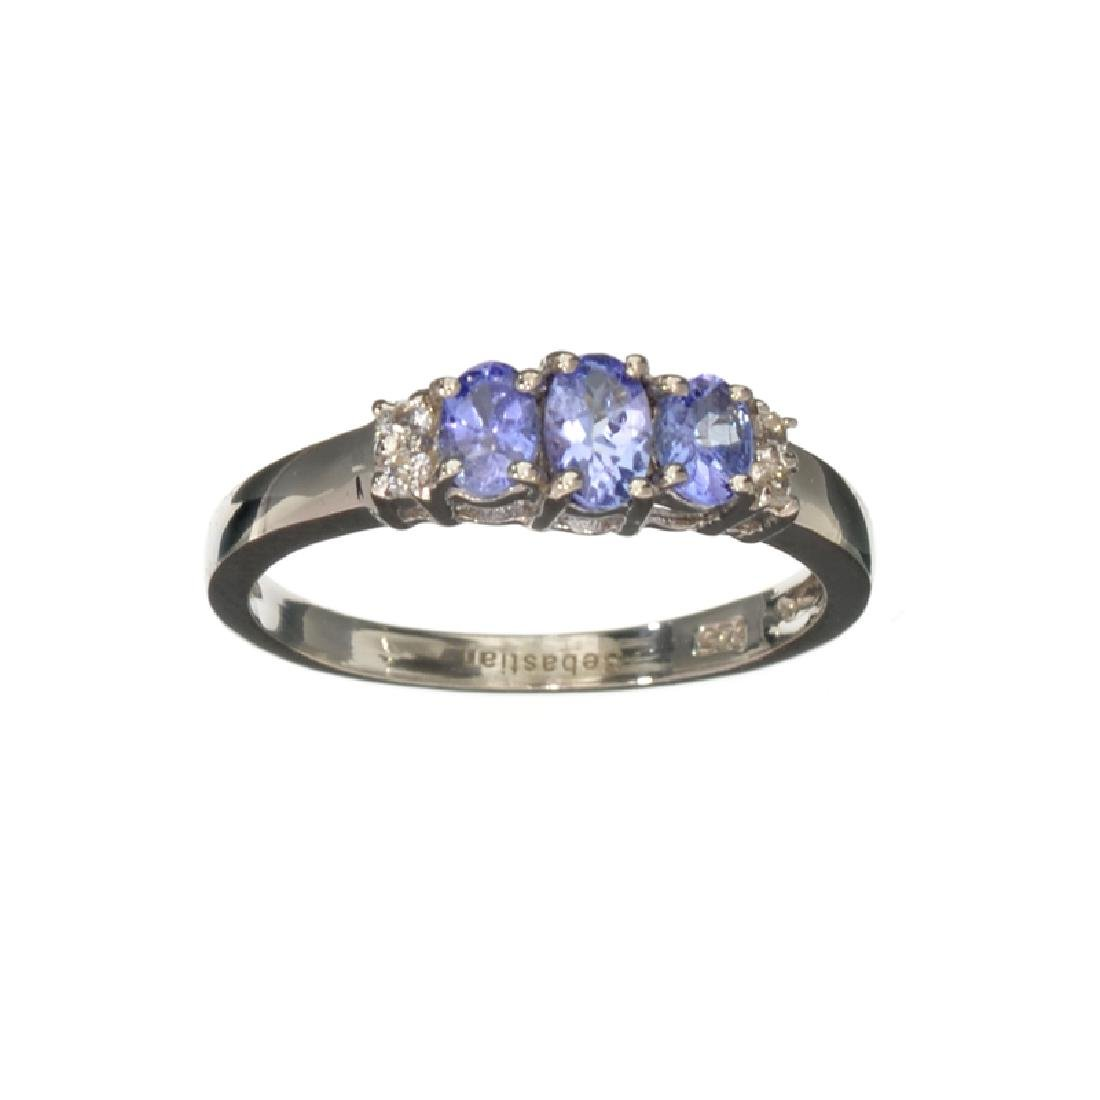 APP: 0.7k Fine Jewelry 0.70CT Oval Cut Tanzanite And